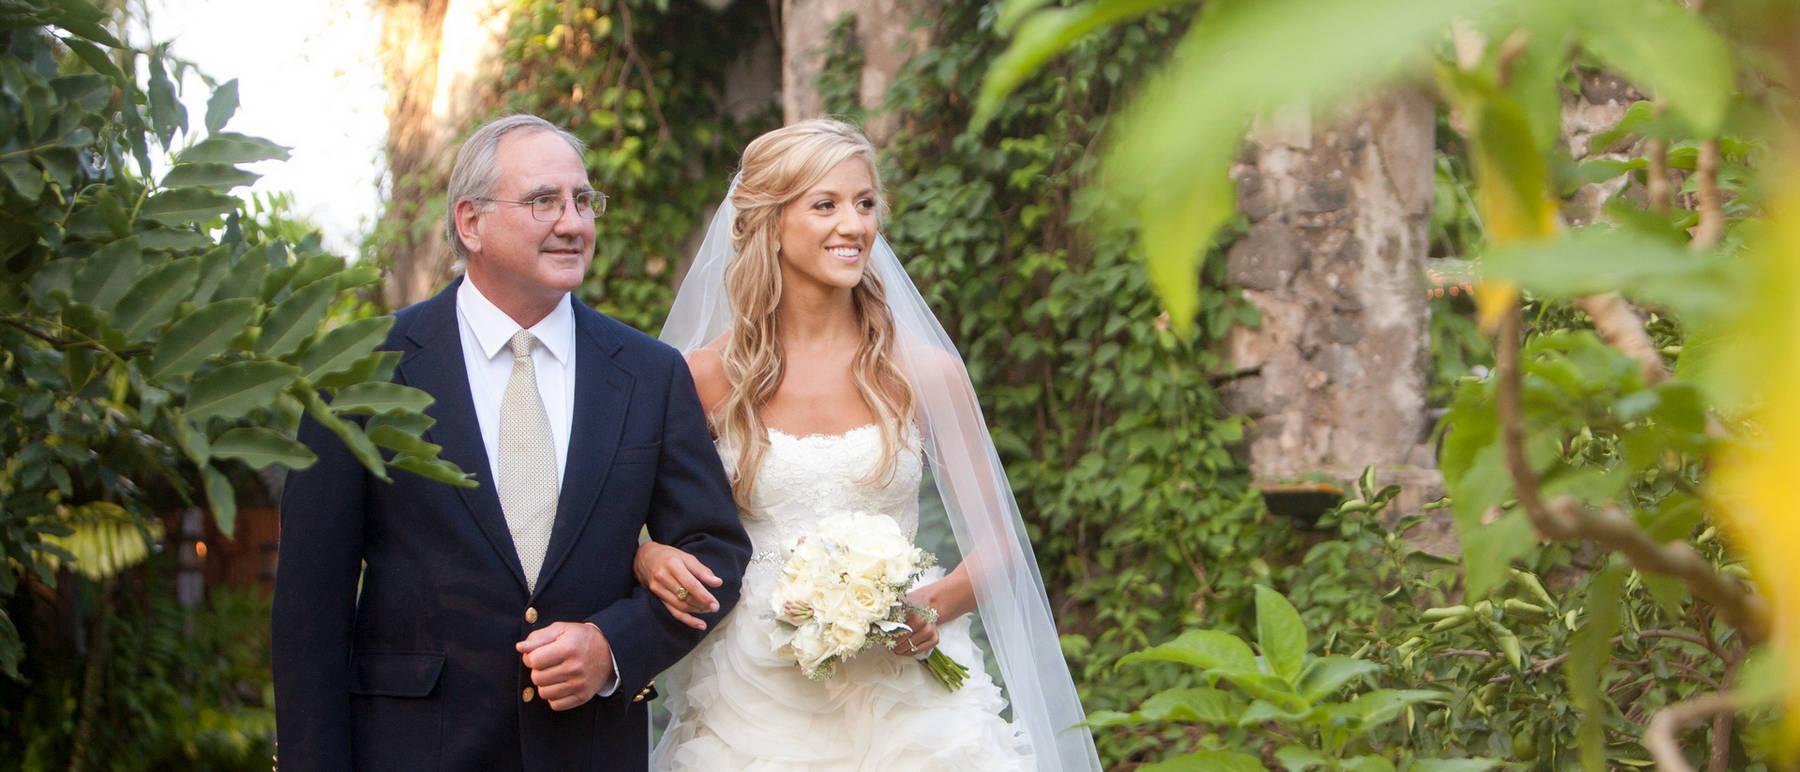 johnandjoseph-wedding-photographer-hz-slider-368